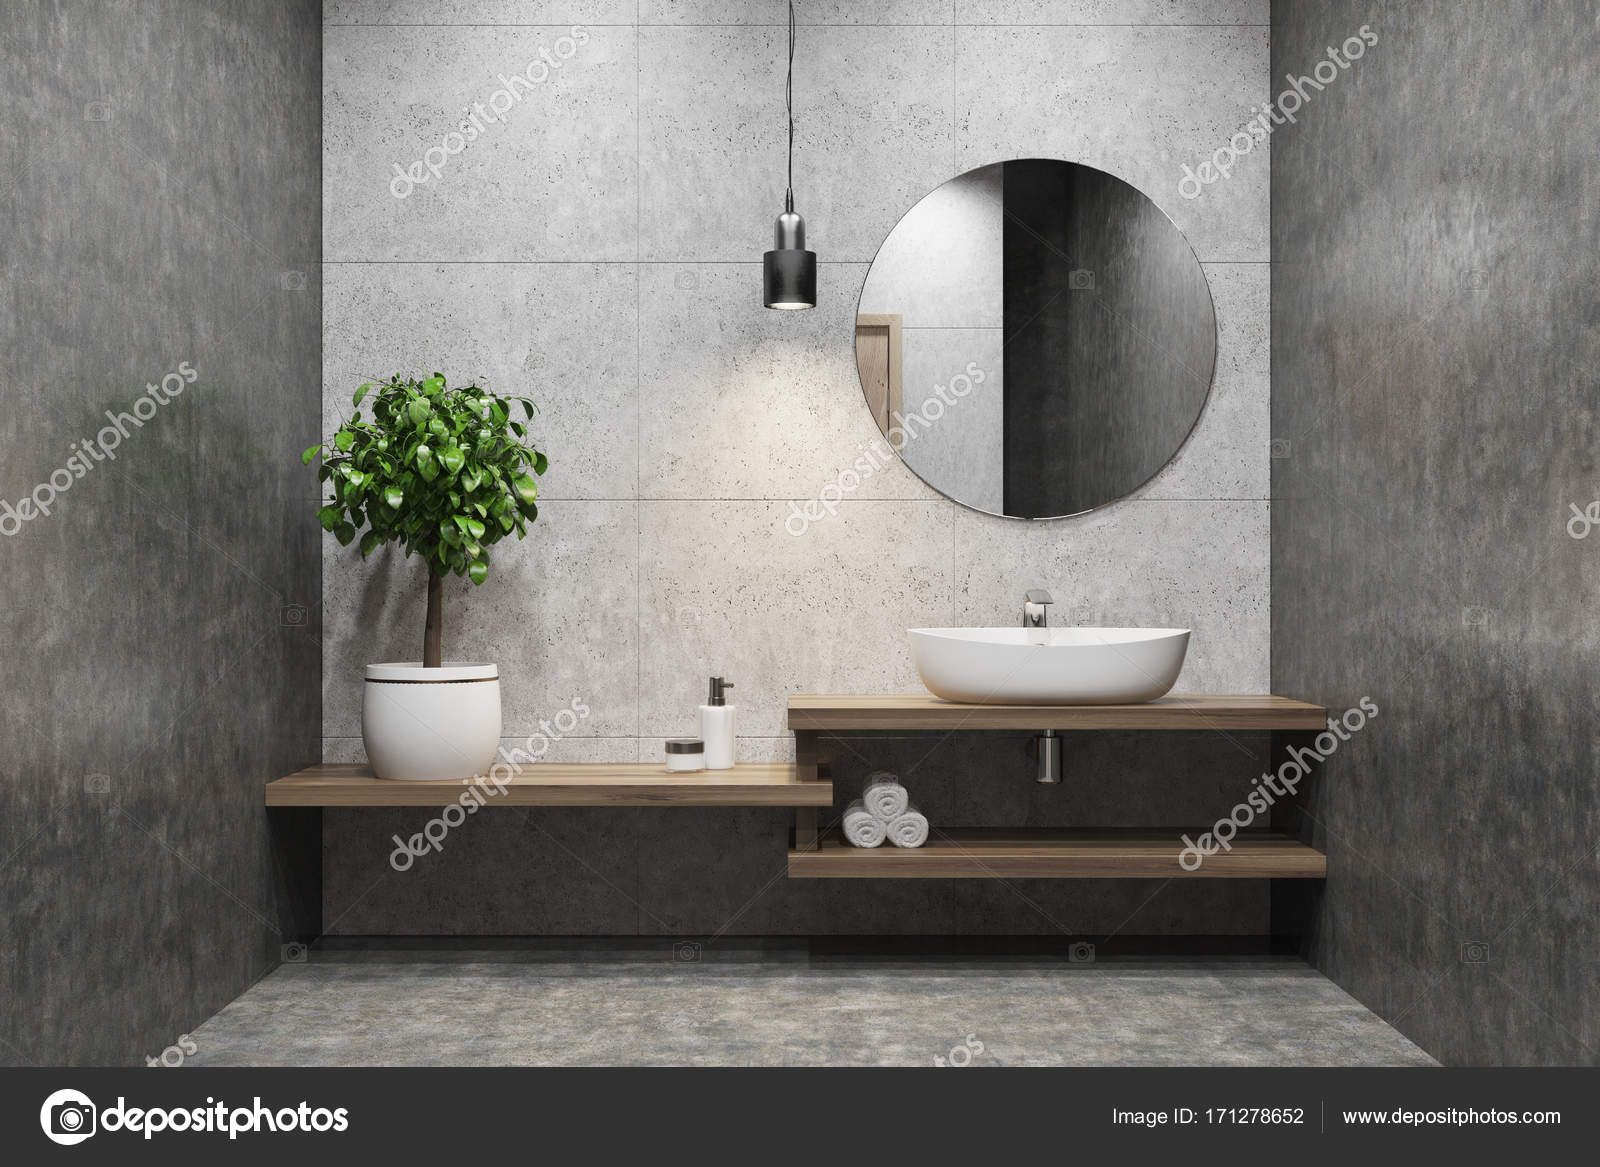 Betonnen wastafel badkamer ronde spiegel u2014 stockfoto